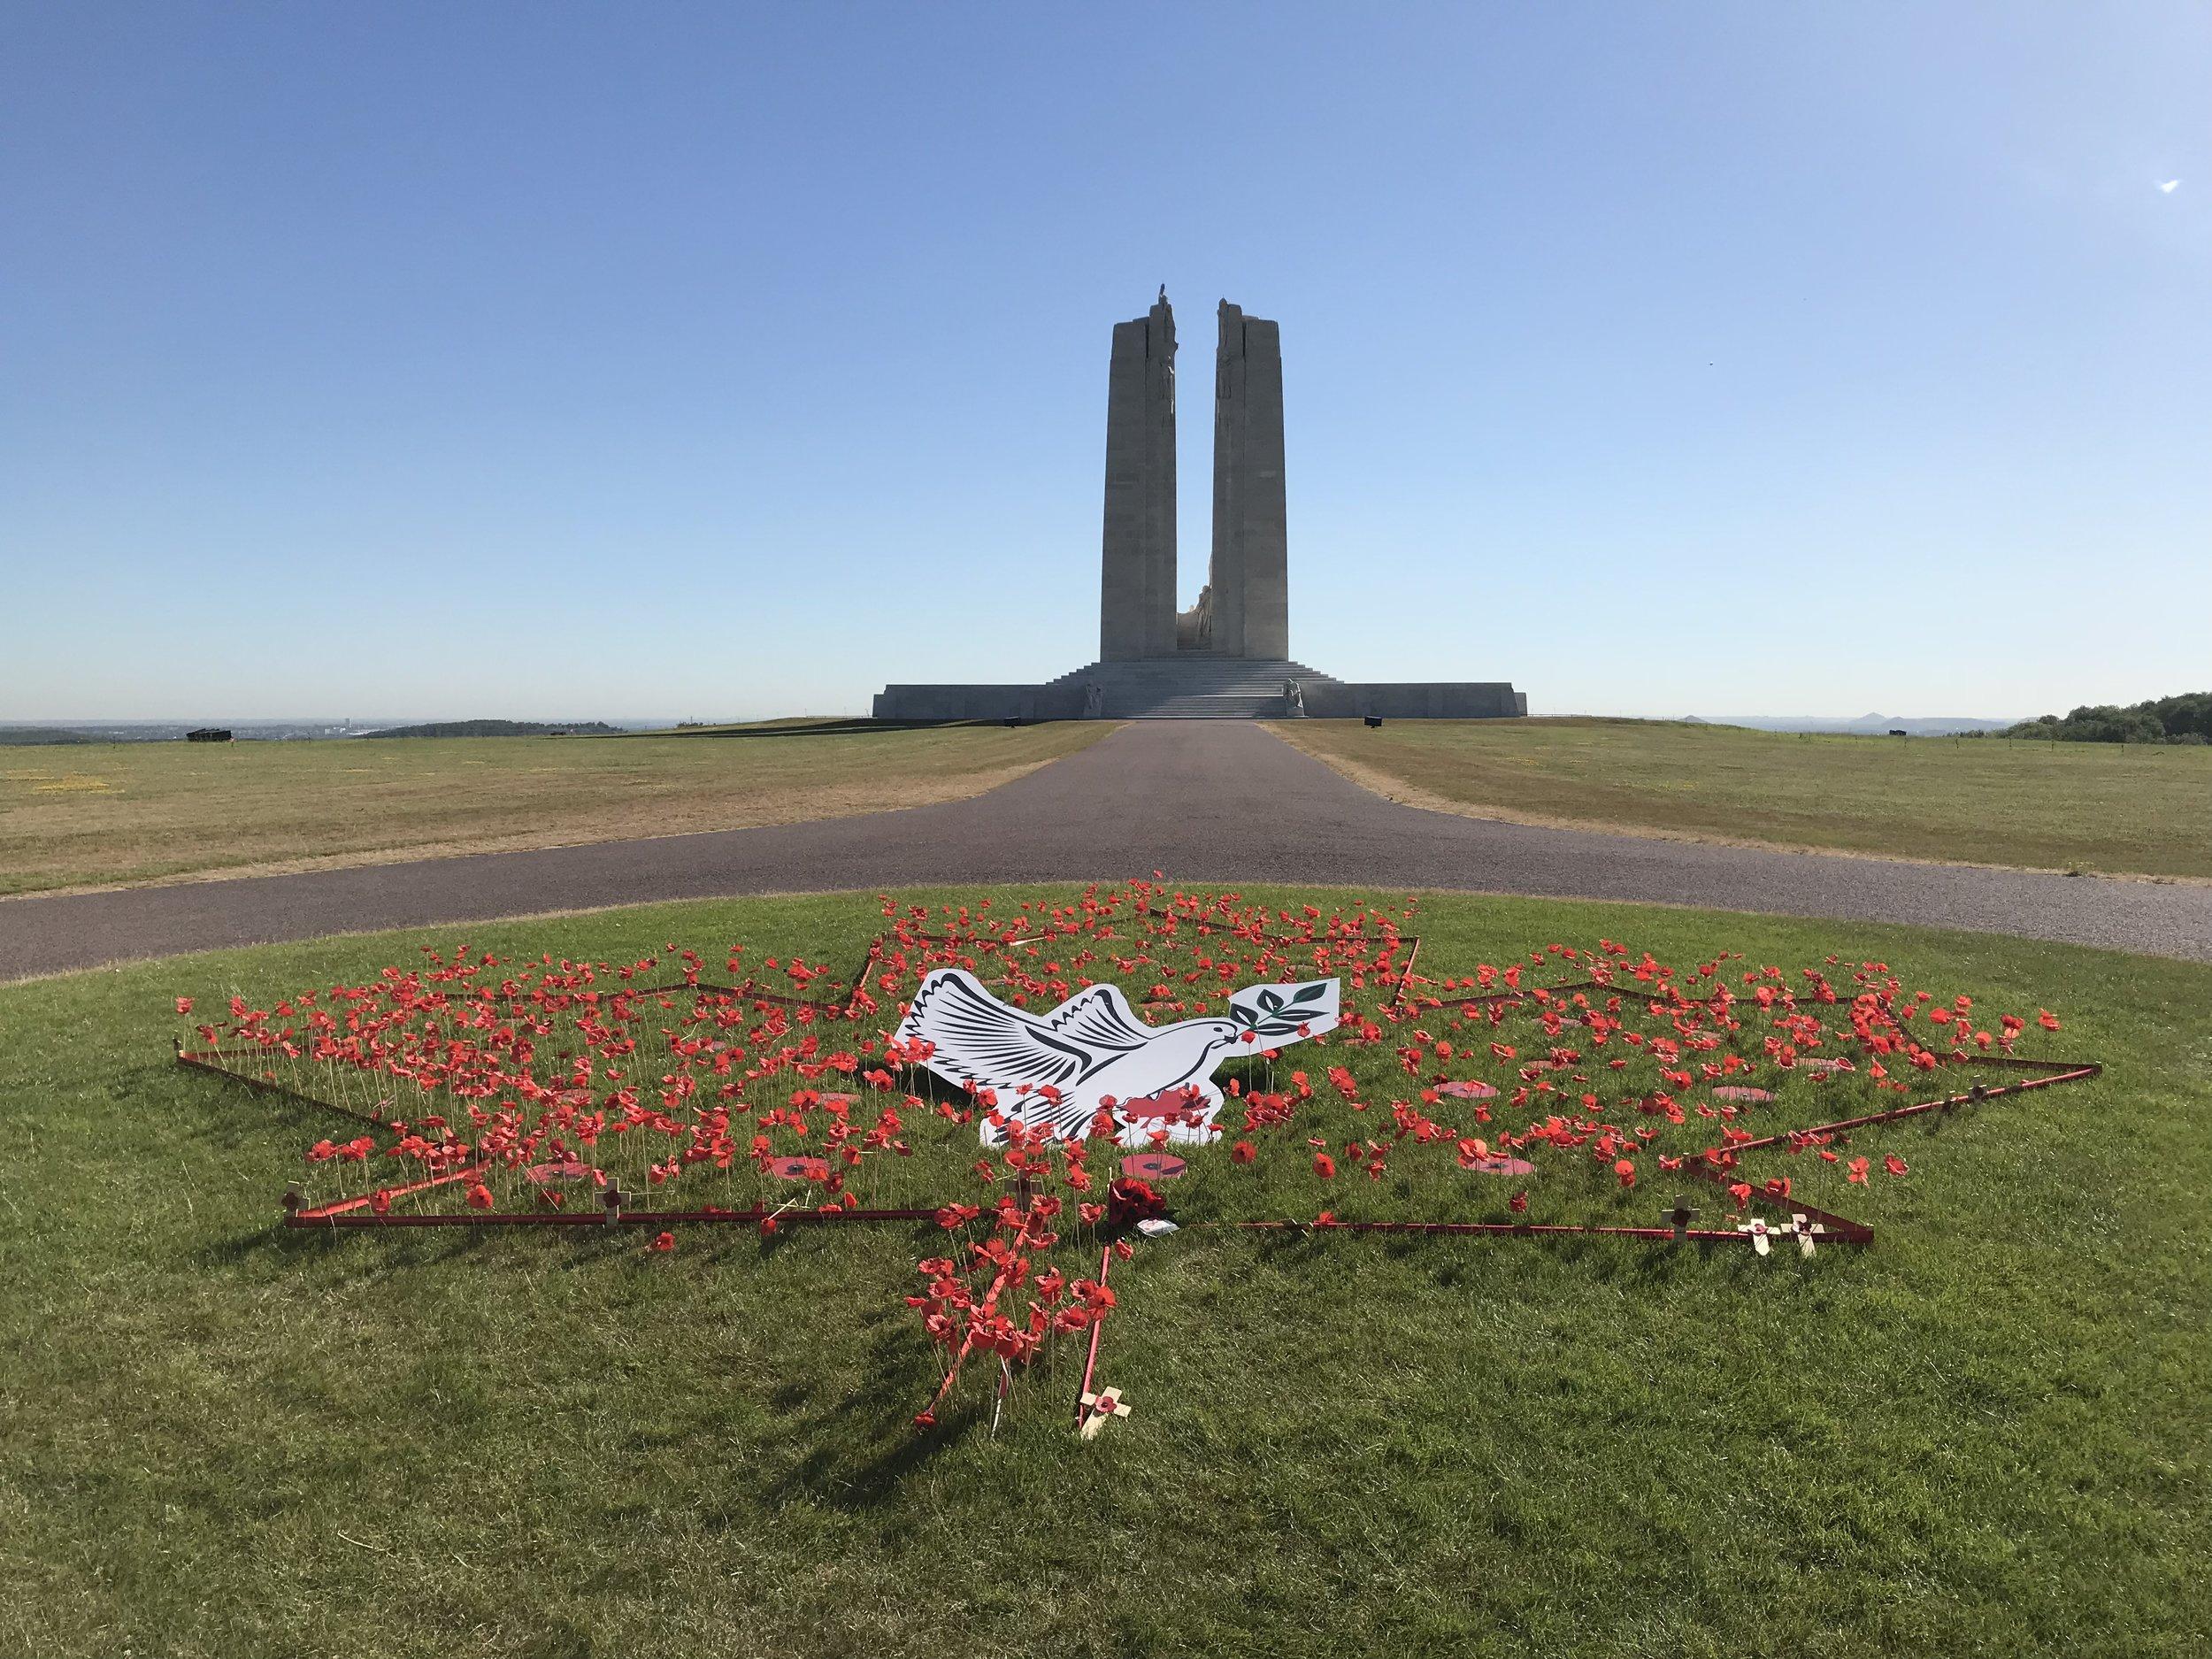 The Vimy ridge memorial in France